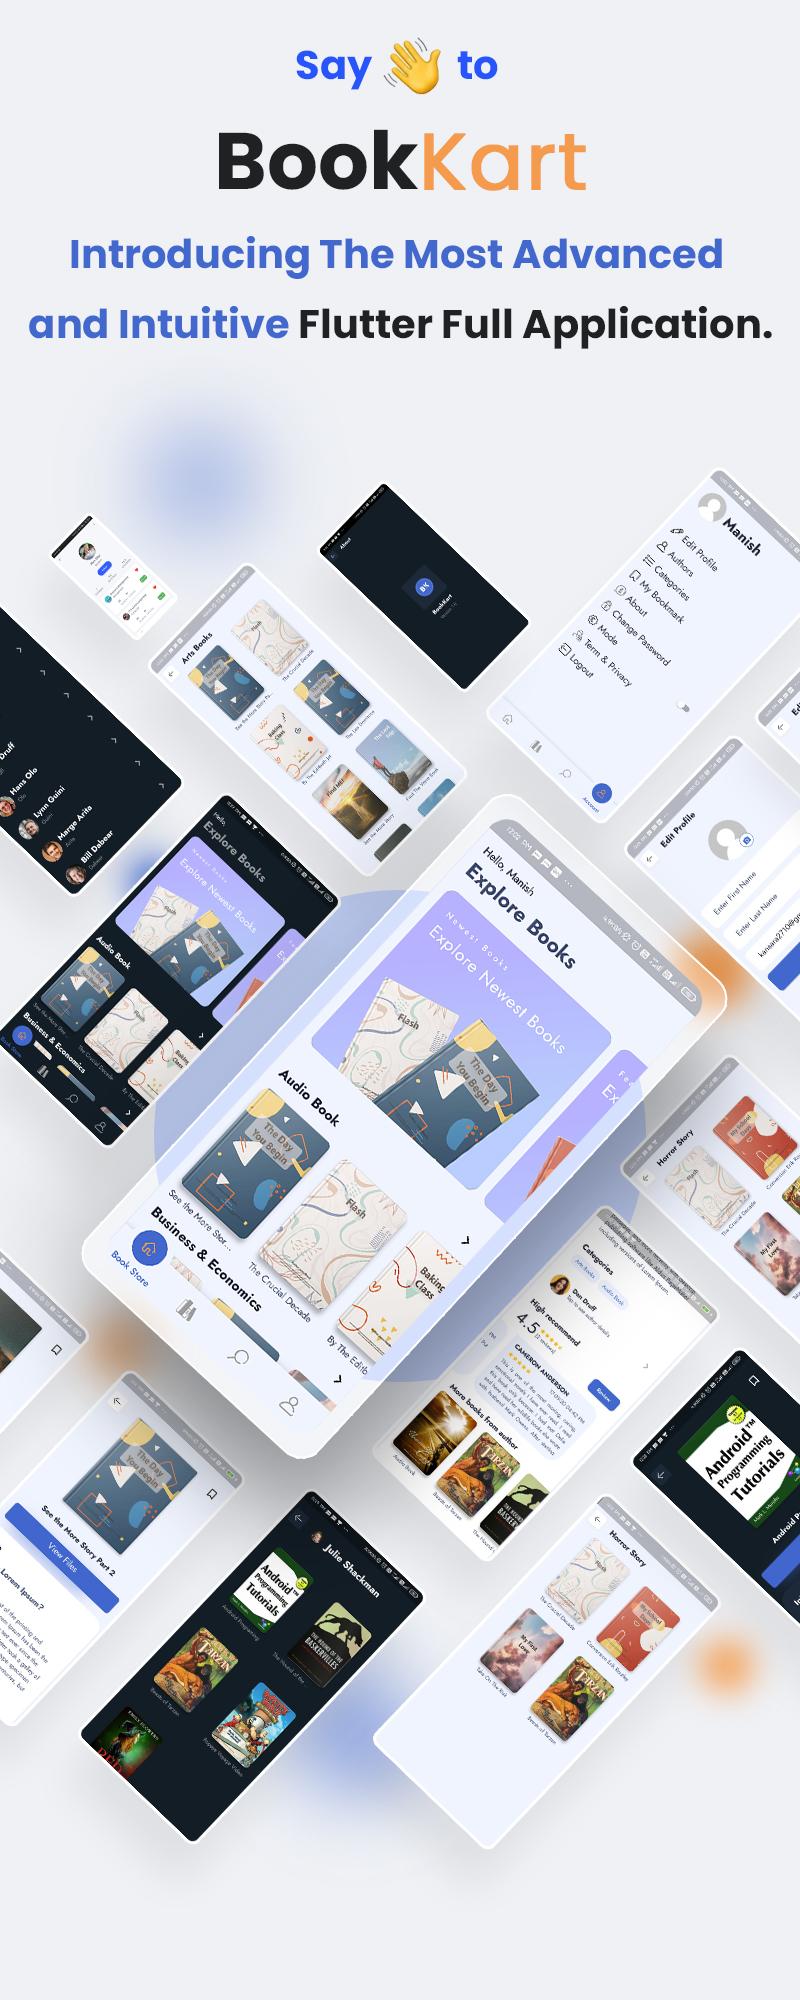 Flutter Ebook App | Bookkart | Iqonic Design flutter ebook reader app for wordpress with woocommerce Bookkart 3